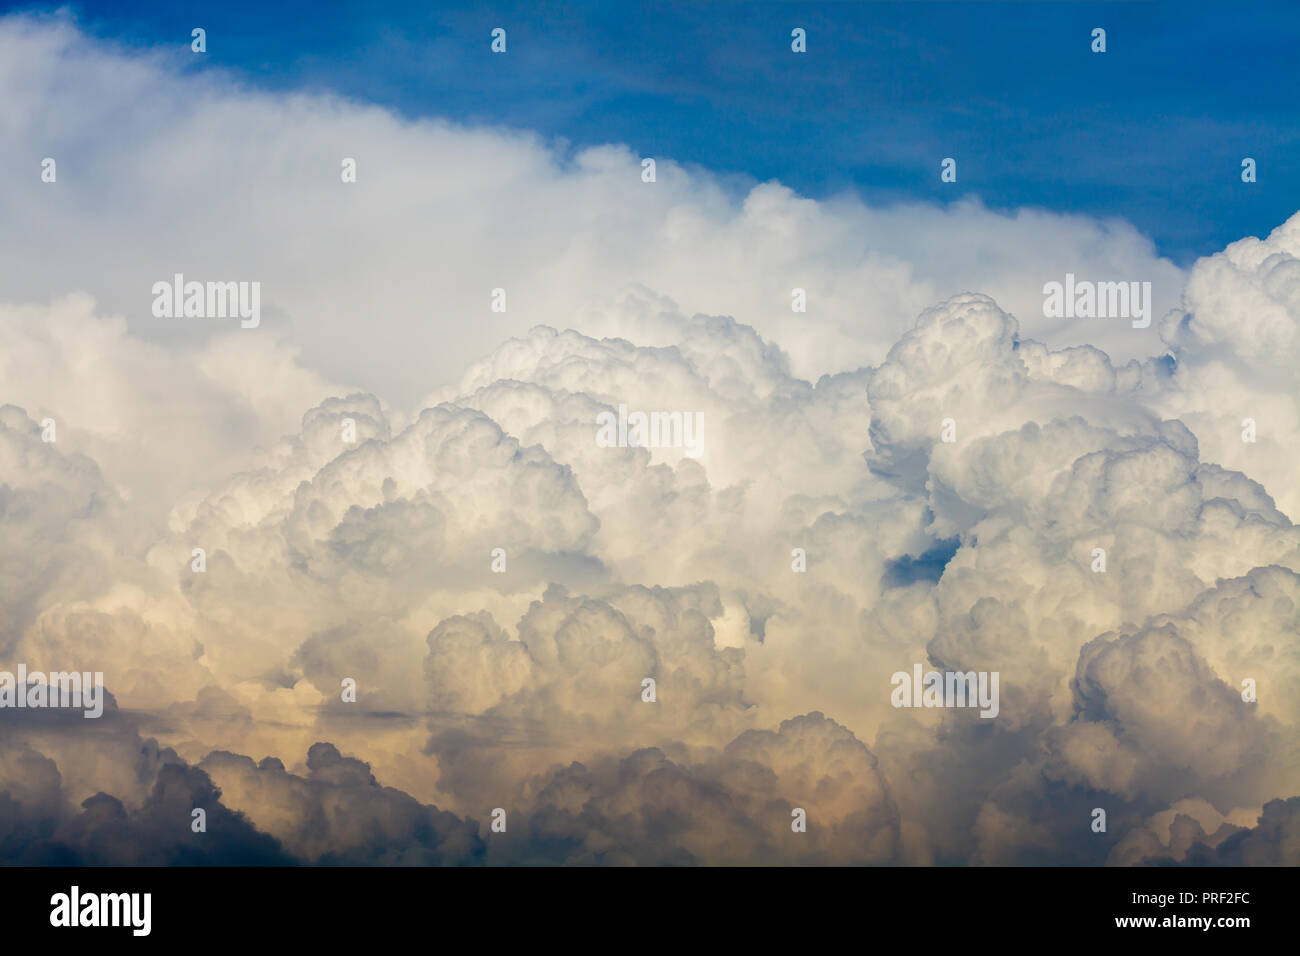 Cumulonimbus clouds against blue sky - Stock Image